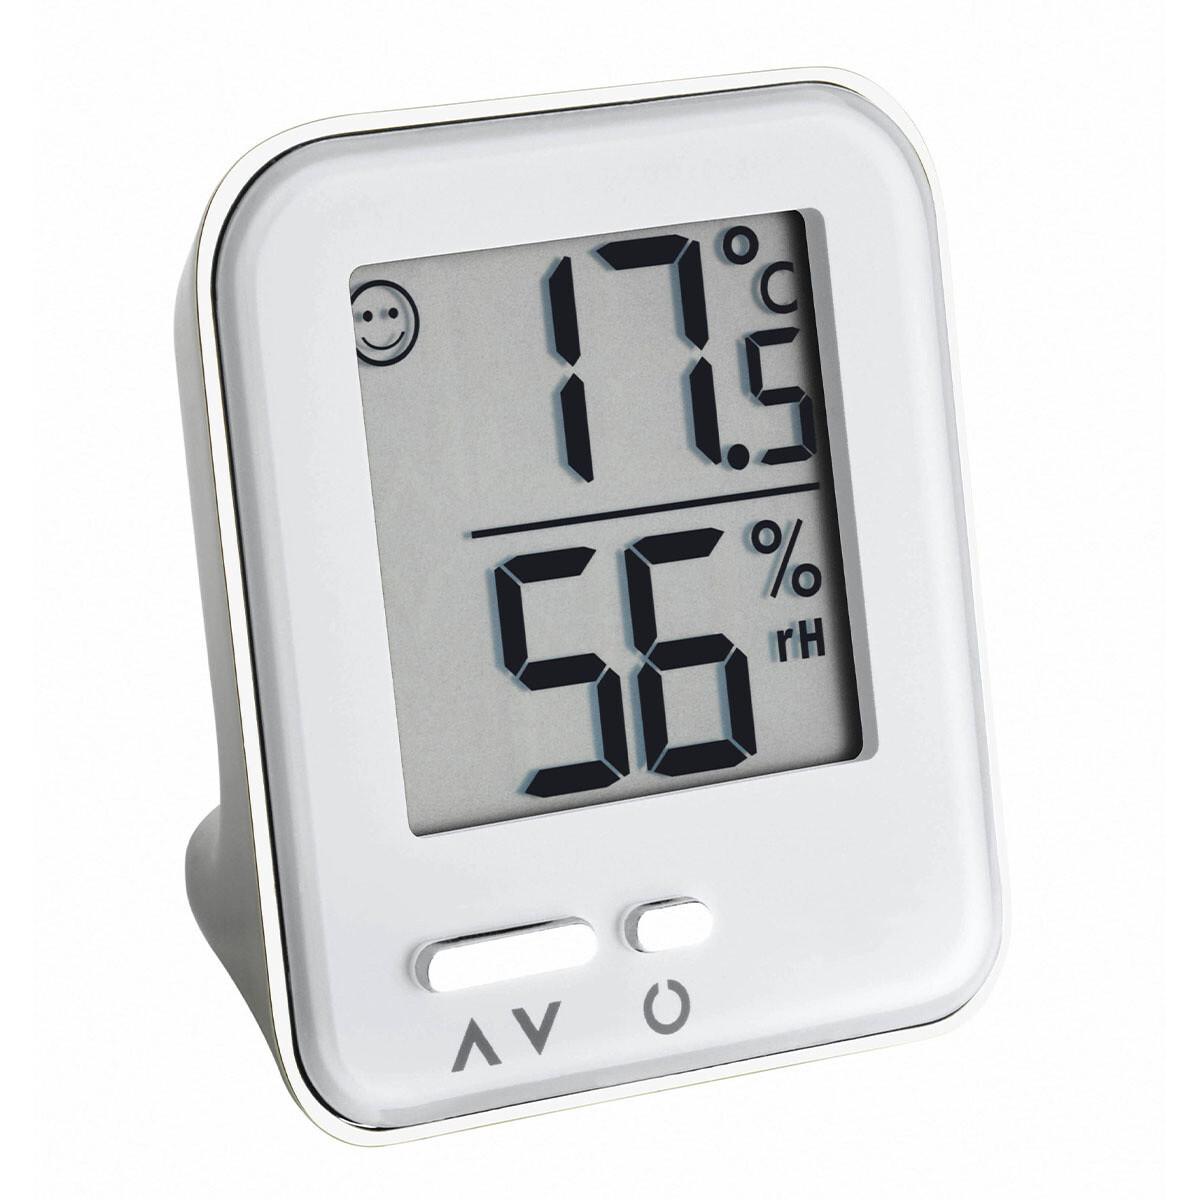 Digitales Thermo-Hygrometer METAL MOXX